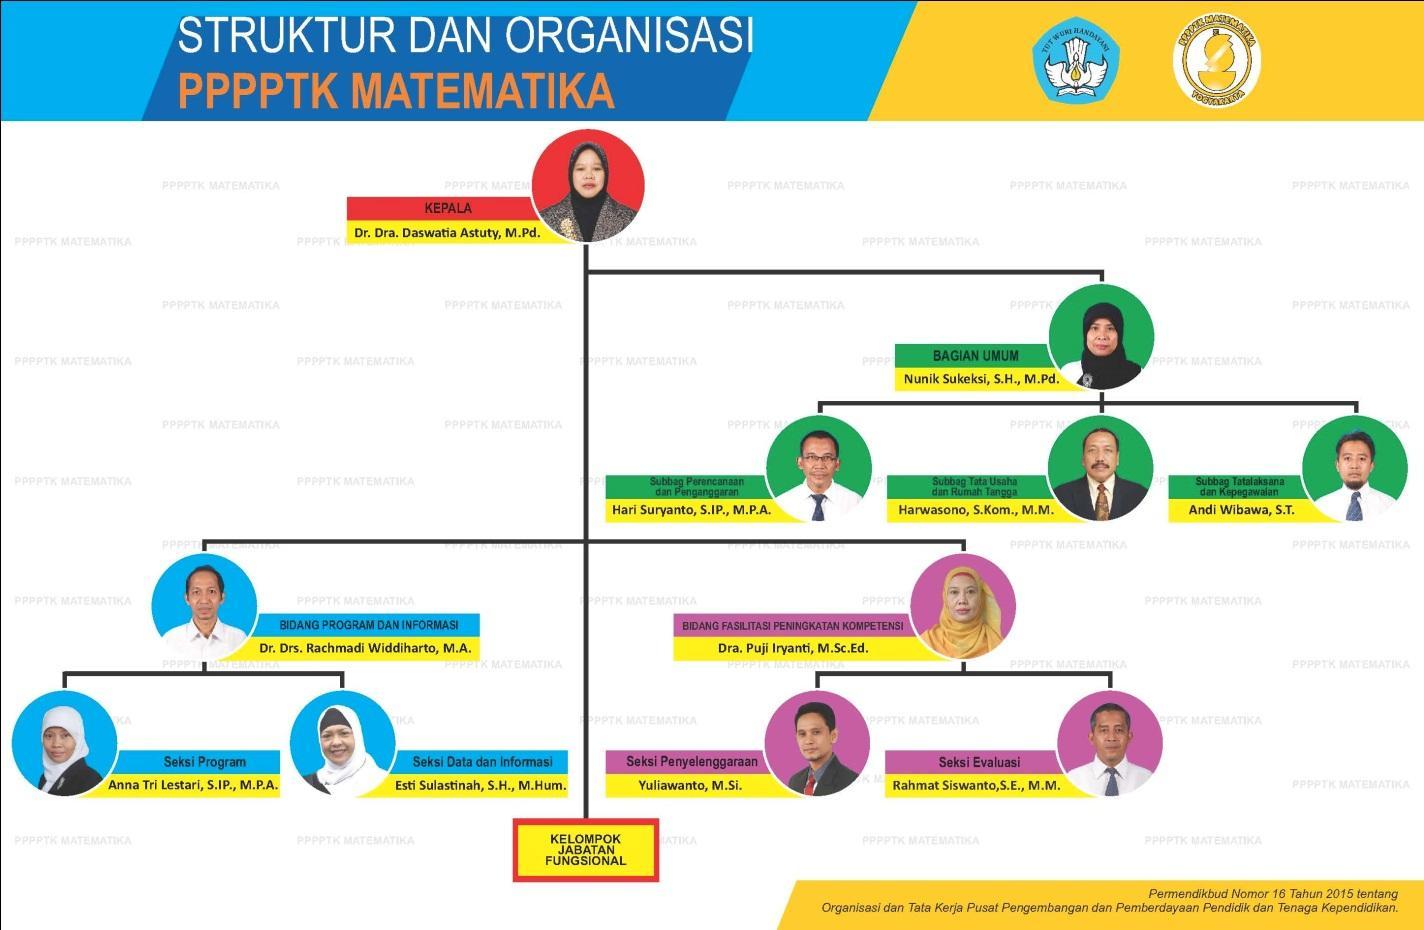 D:\2019\190901 - GI Makassar\struktur organisasi p4tk mat 2017.3_1.jpg